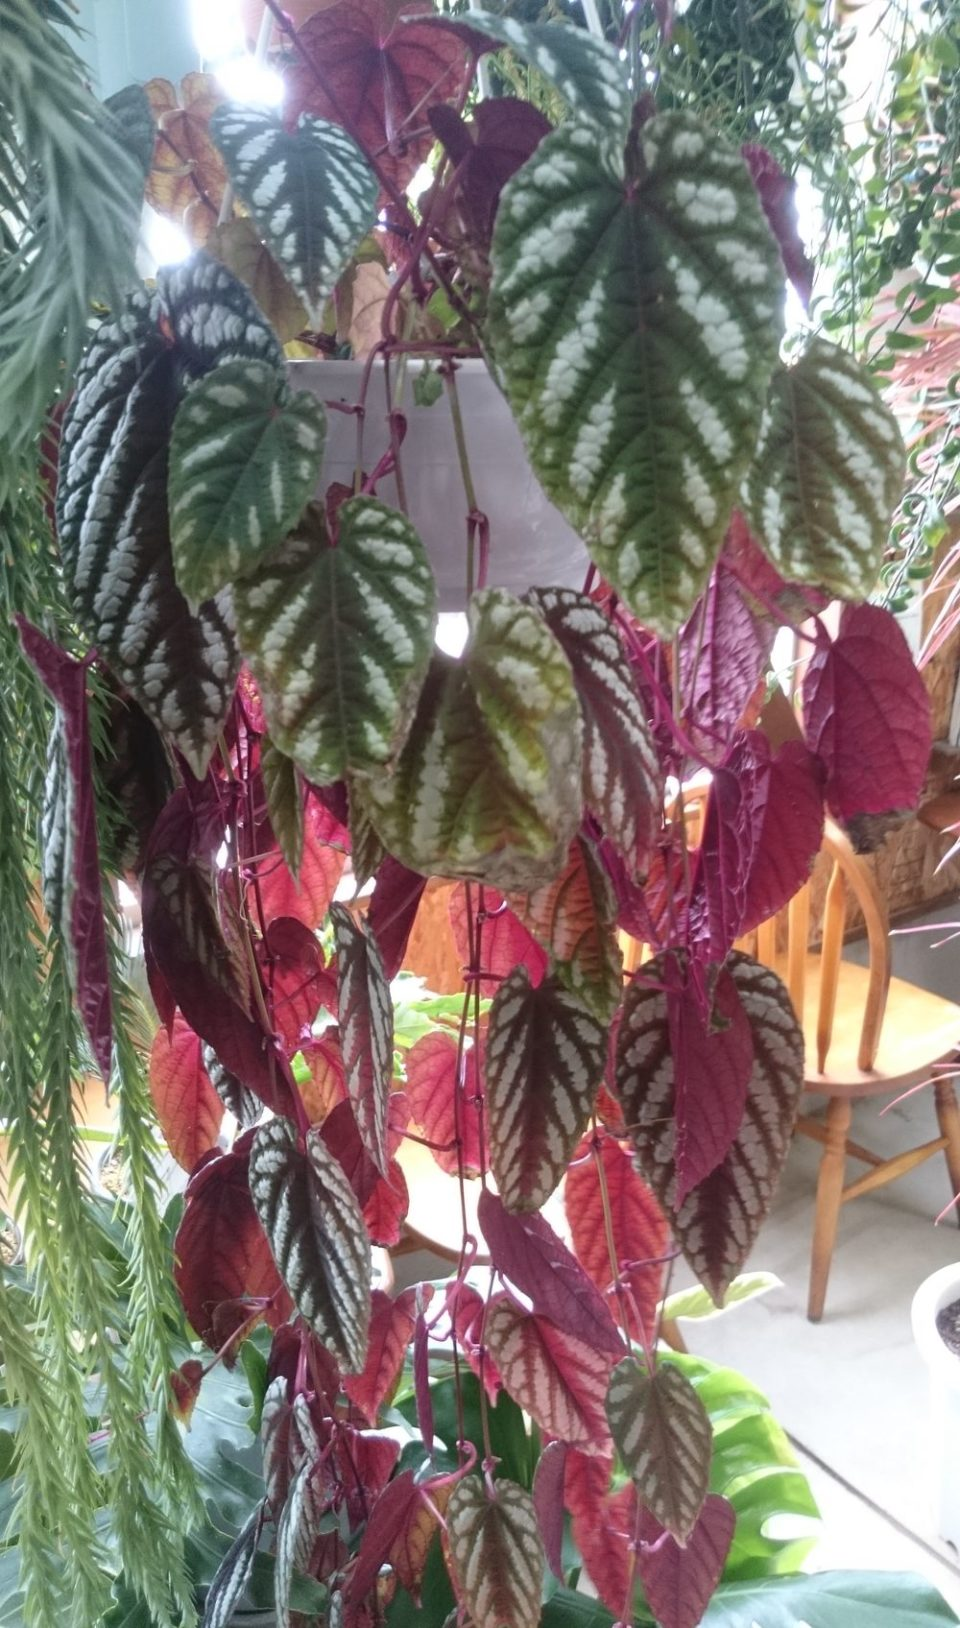 cocoha(ココハ)長さのある観葉植物